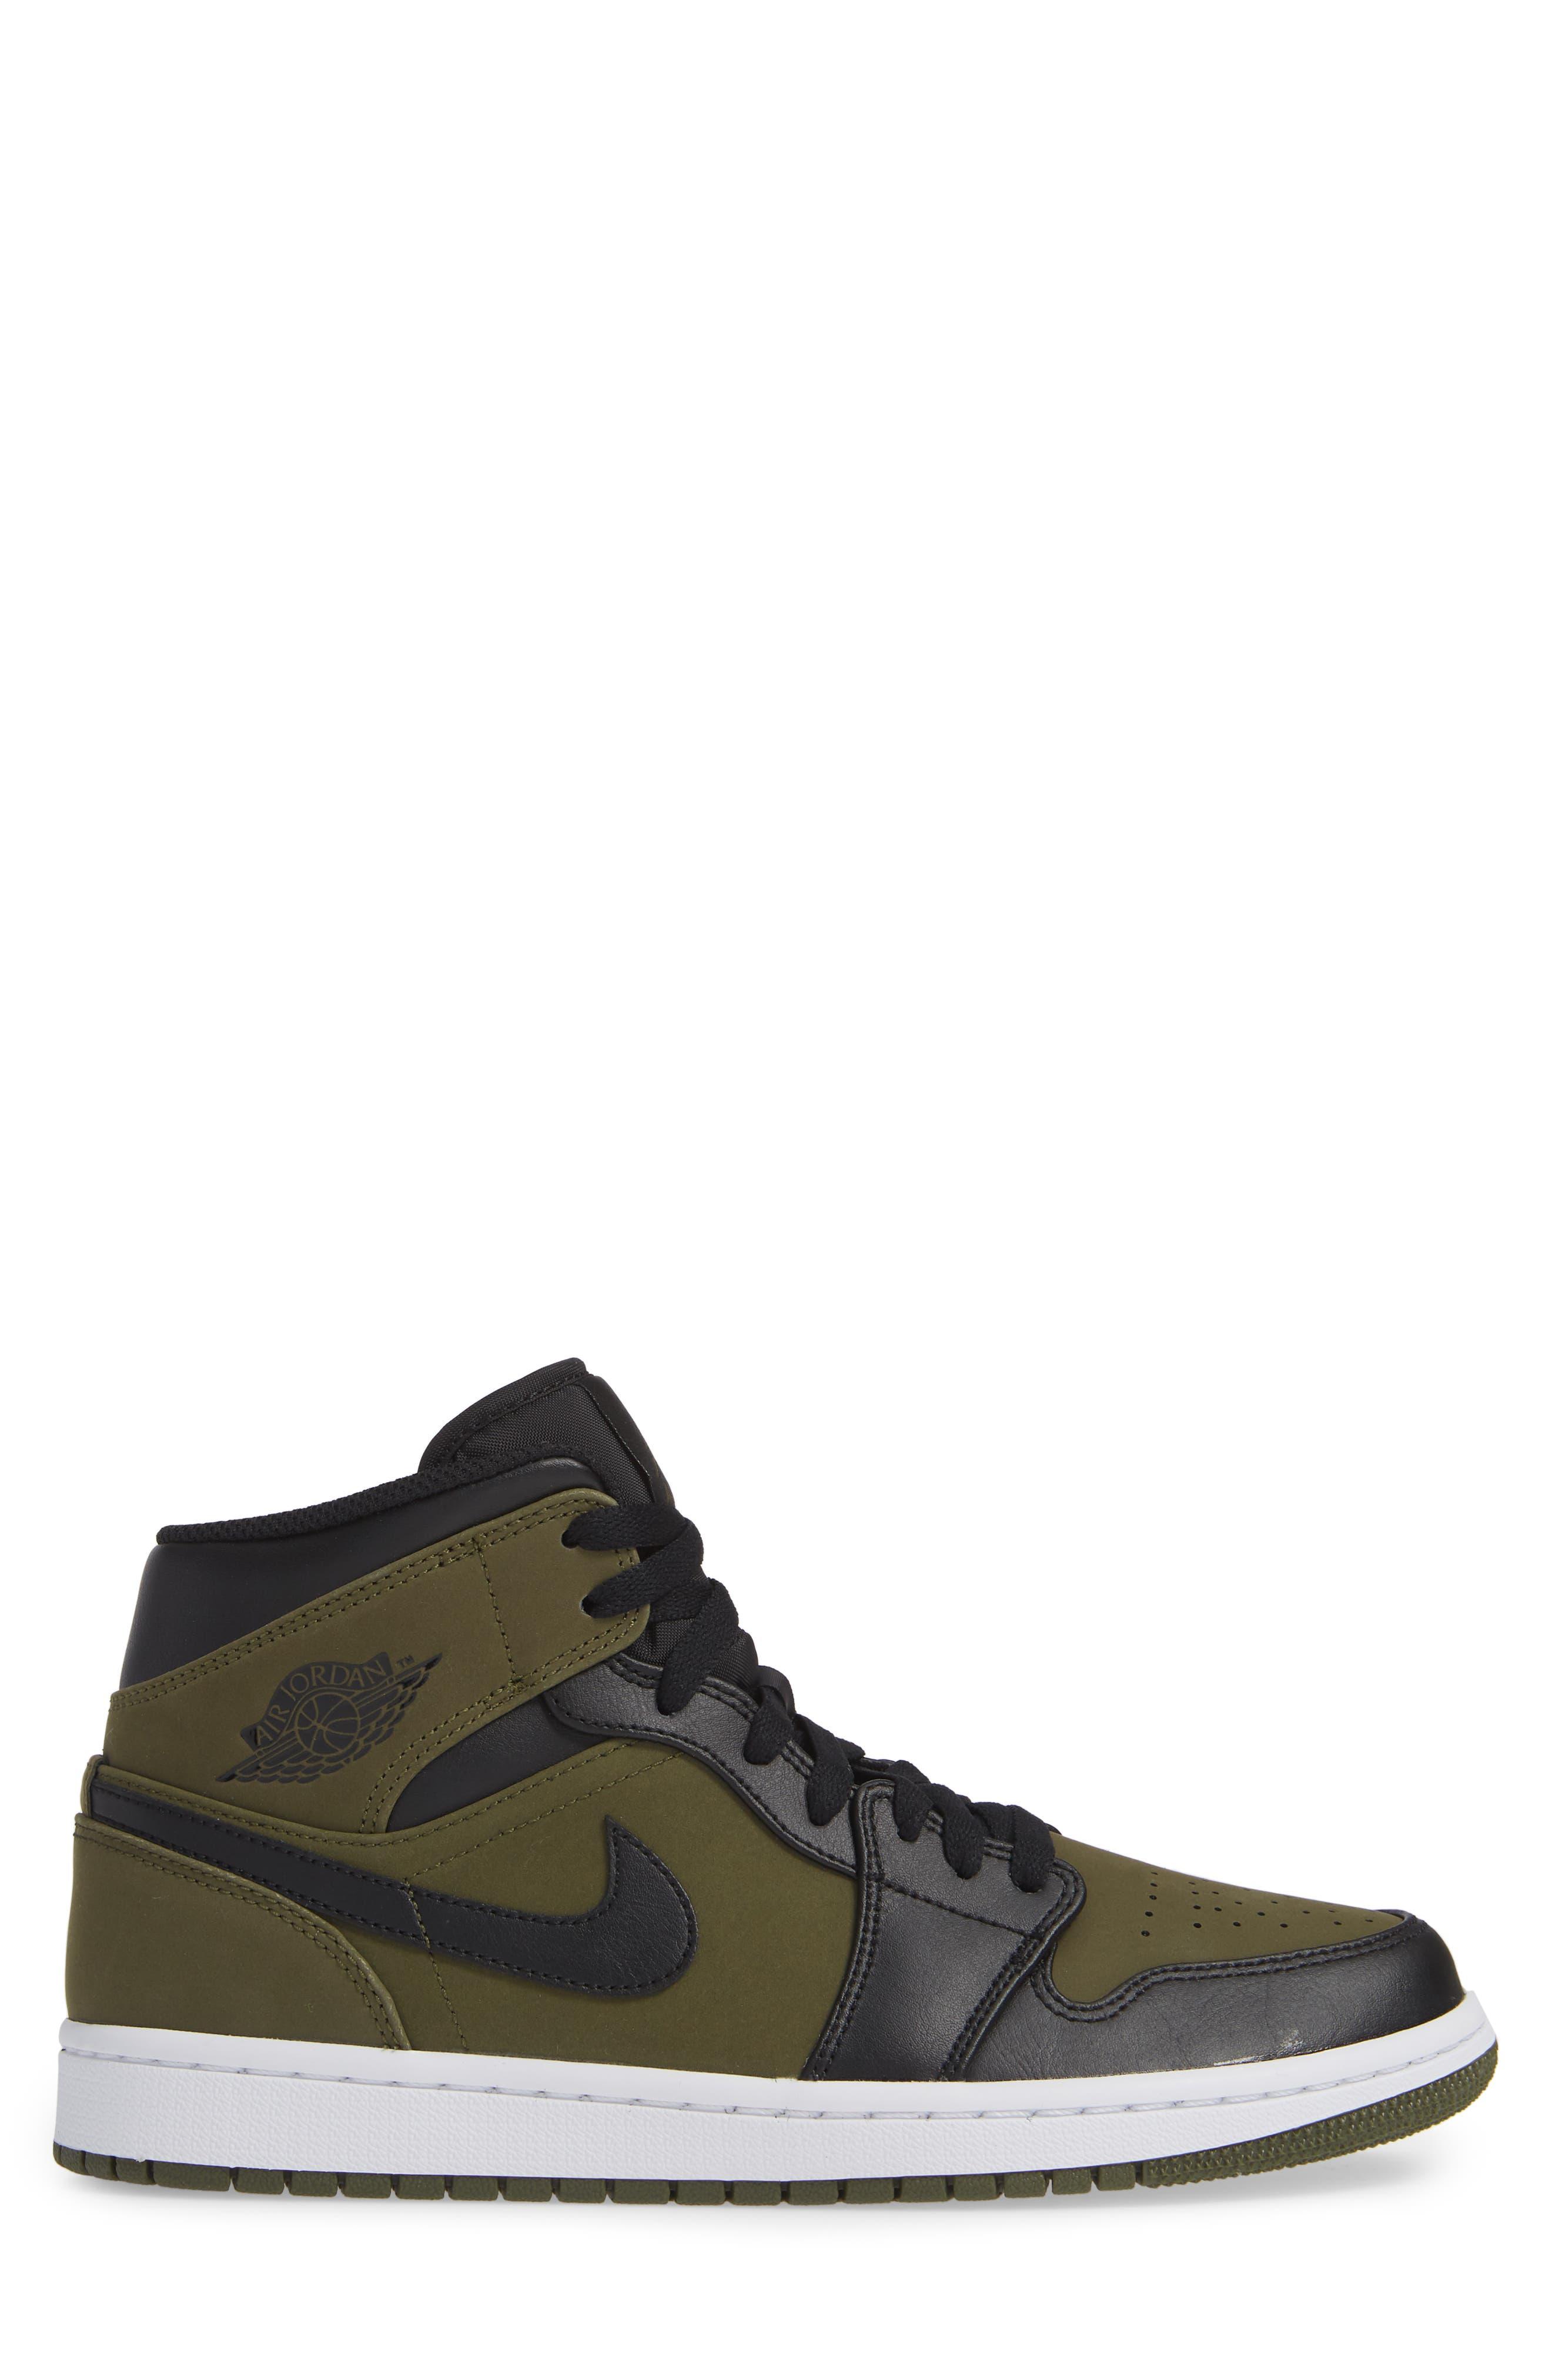 'Air Jordan 1 Mid' Sneaker,                             Alternate thumbnail 3, color,                             OLIVE CANVAS/ BLACK/ WHITE